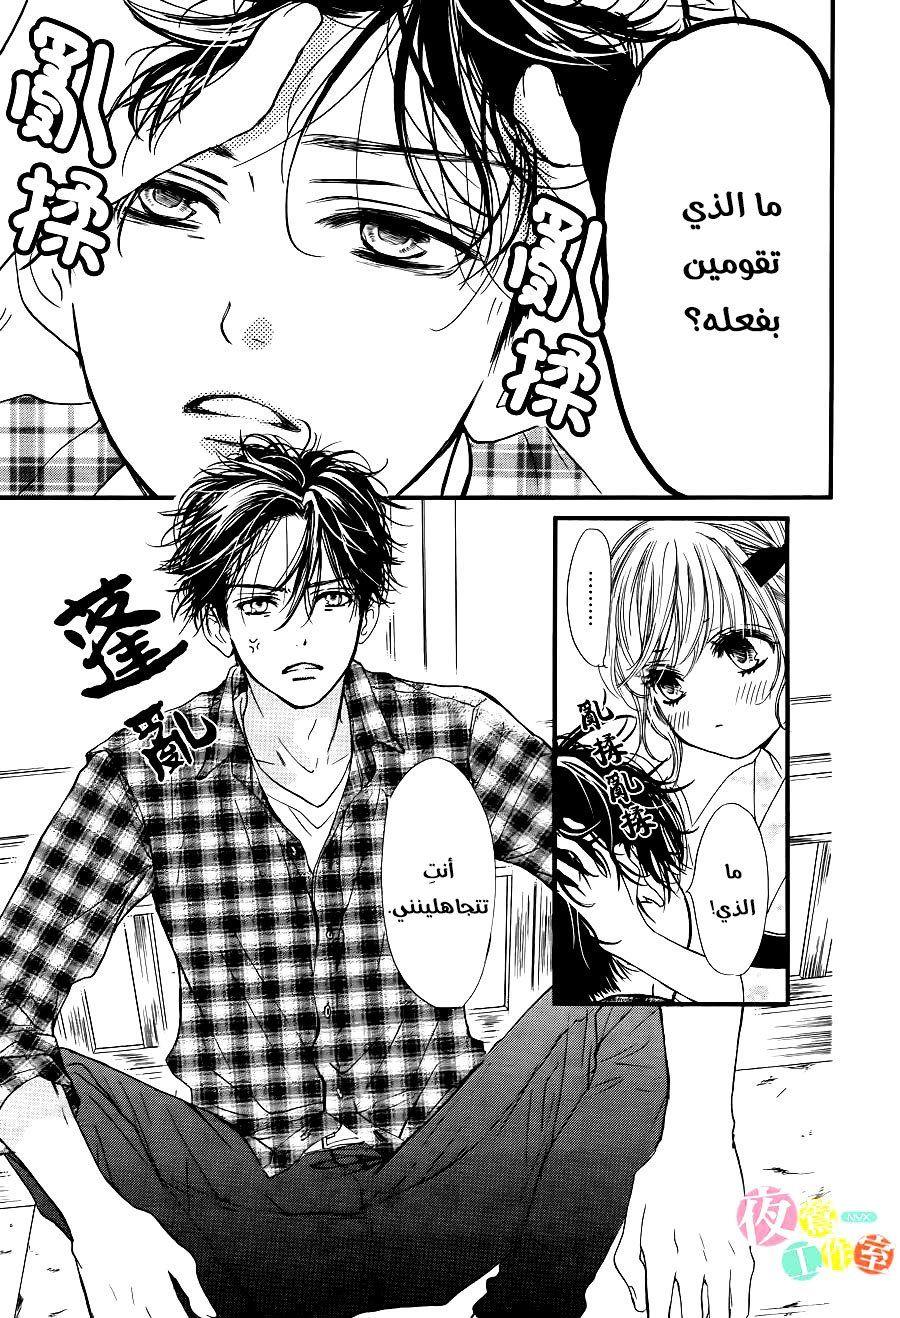 Pin by ˗ˏˋ honeycream ੈ♡˳ ༉‧˚ on manga anime in 2020